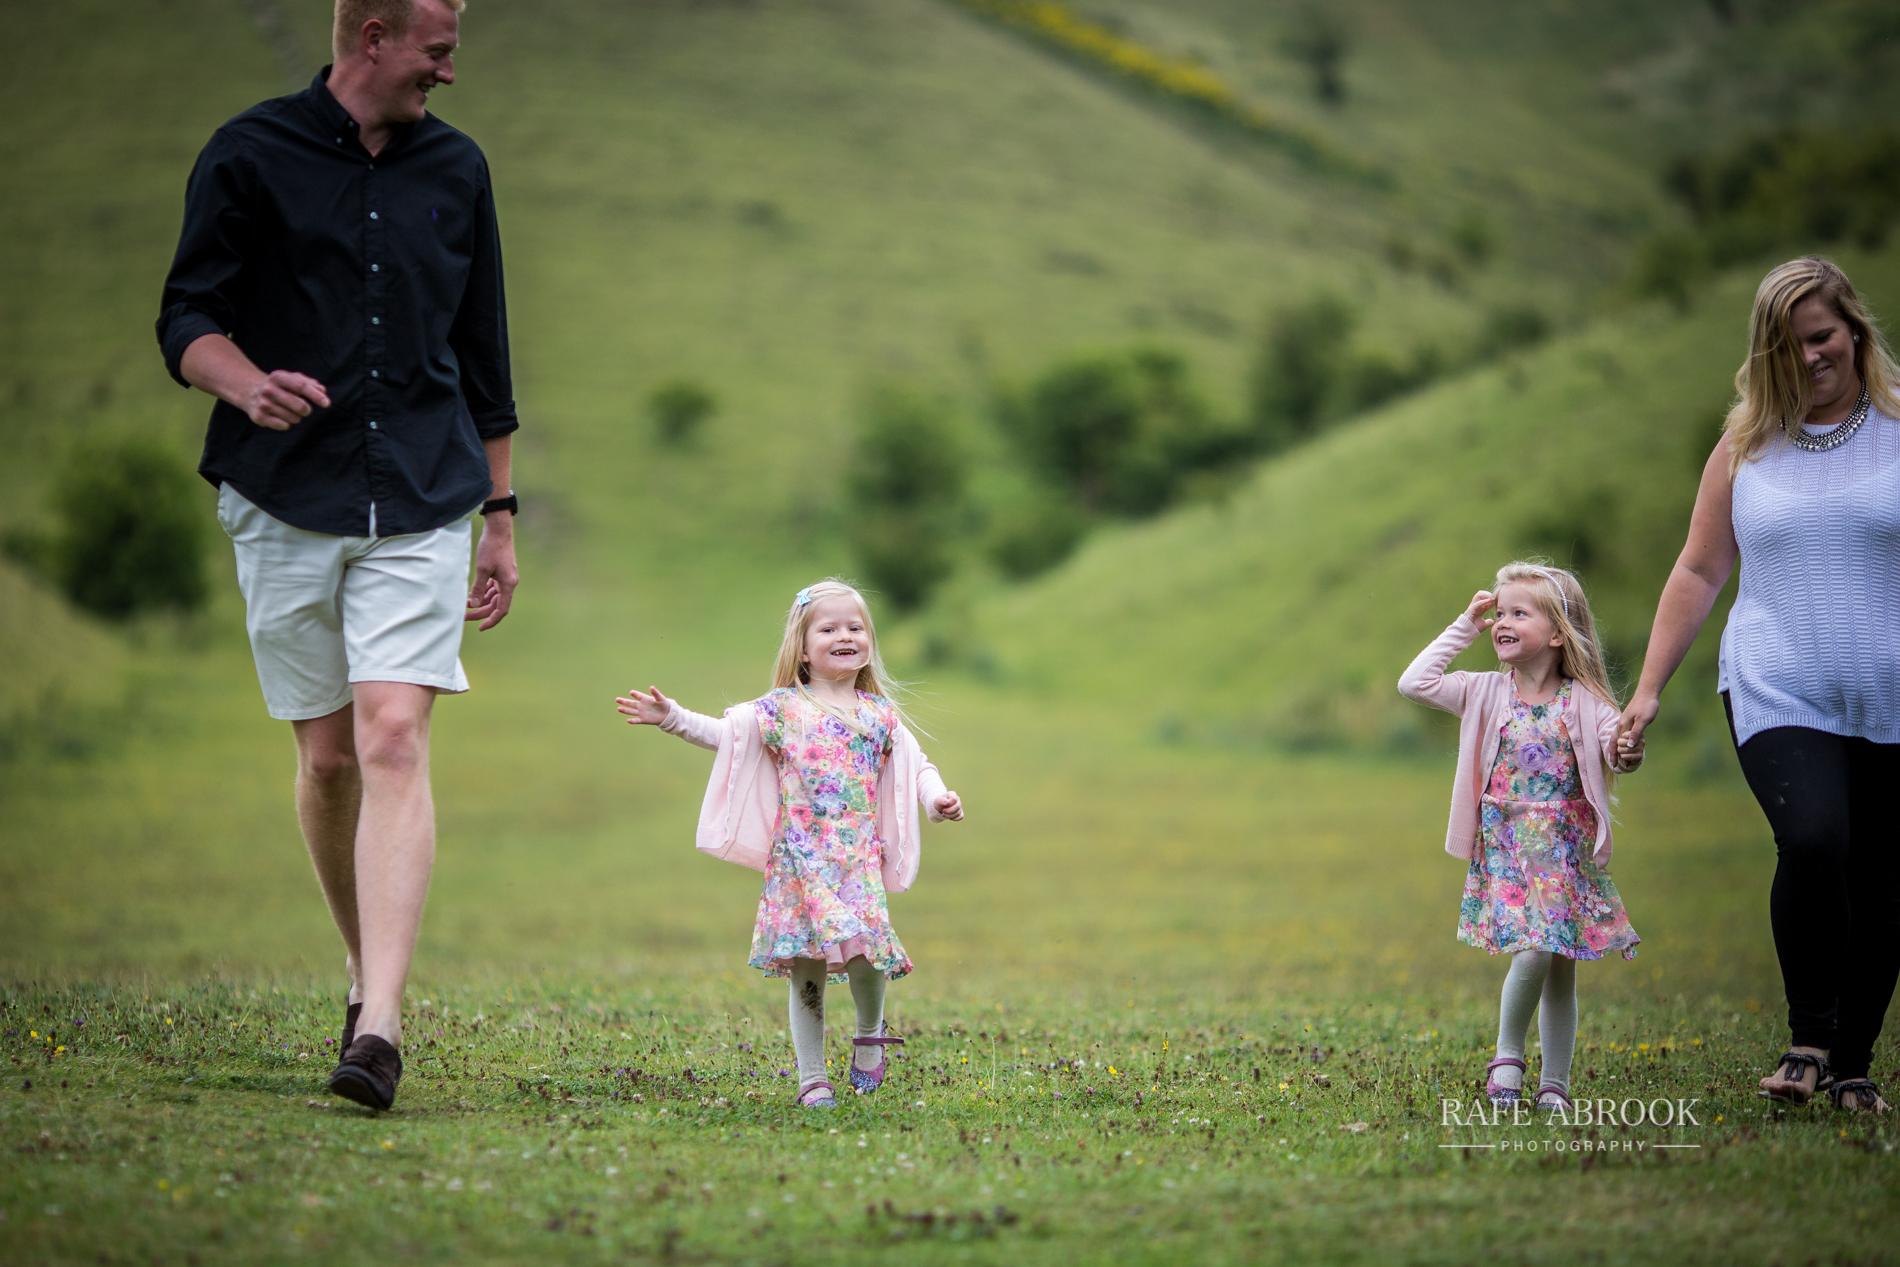 lisa & danny engagement shoot barton hills barton-le-clay bedfordshire-1016.jpg